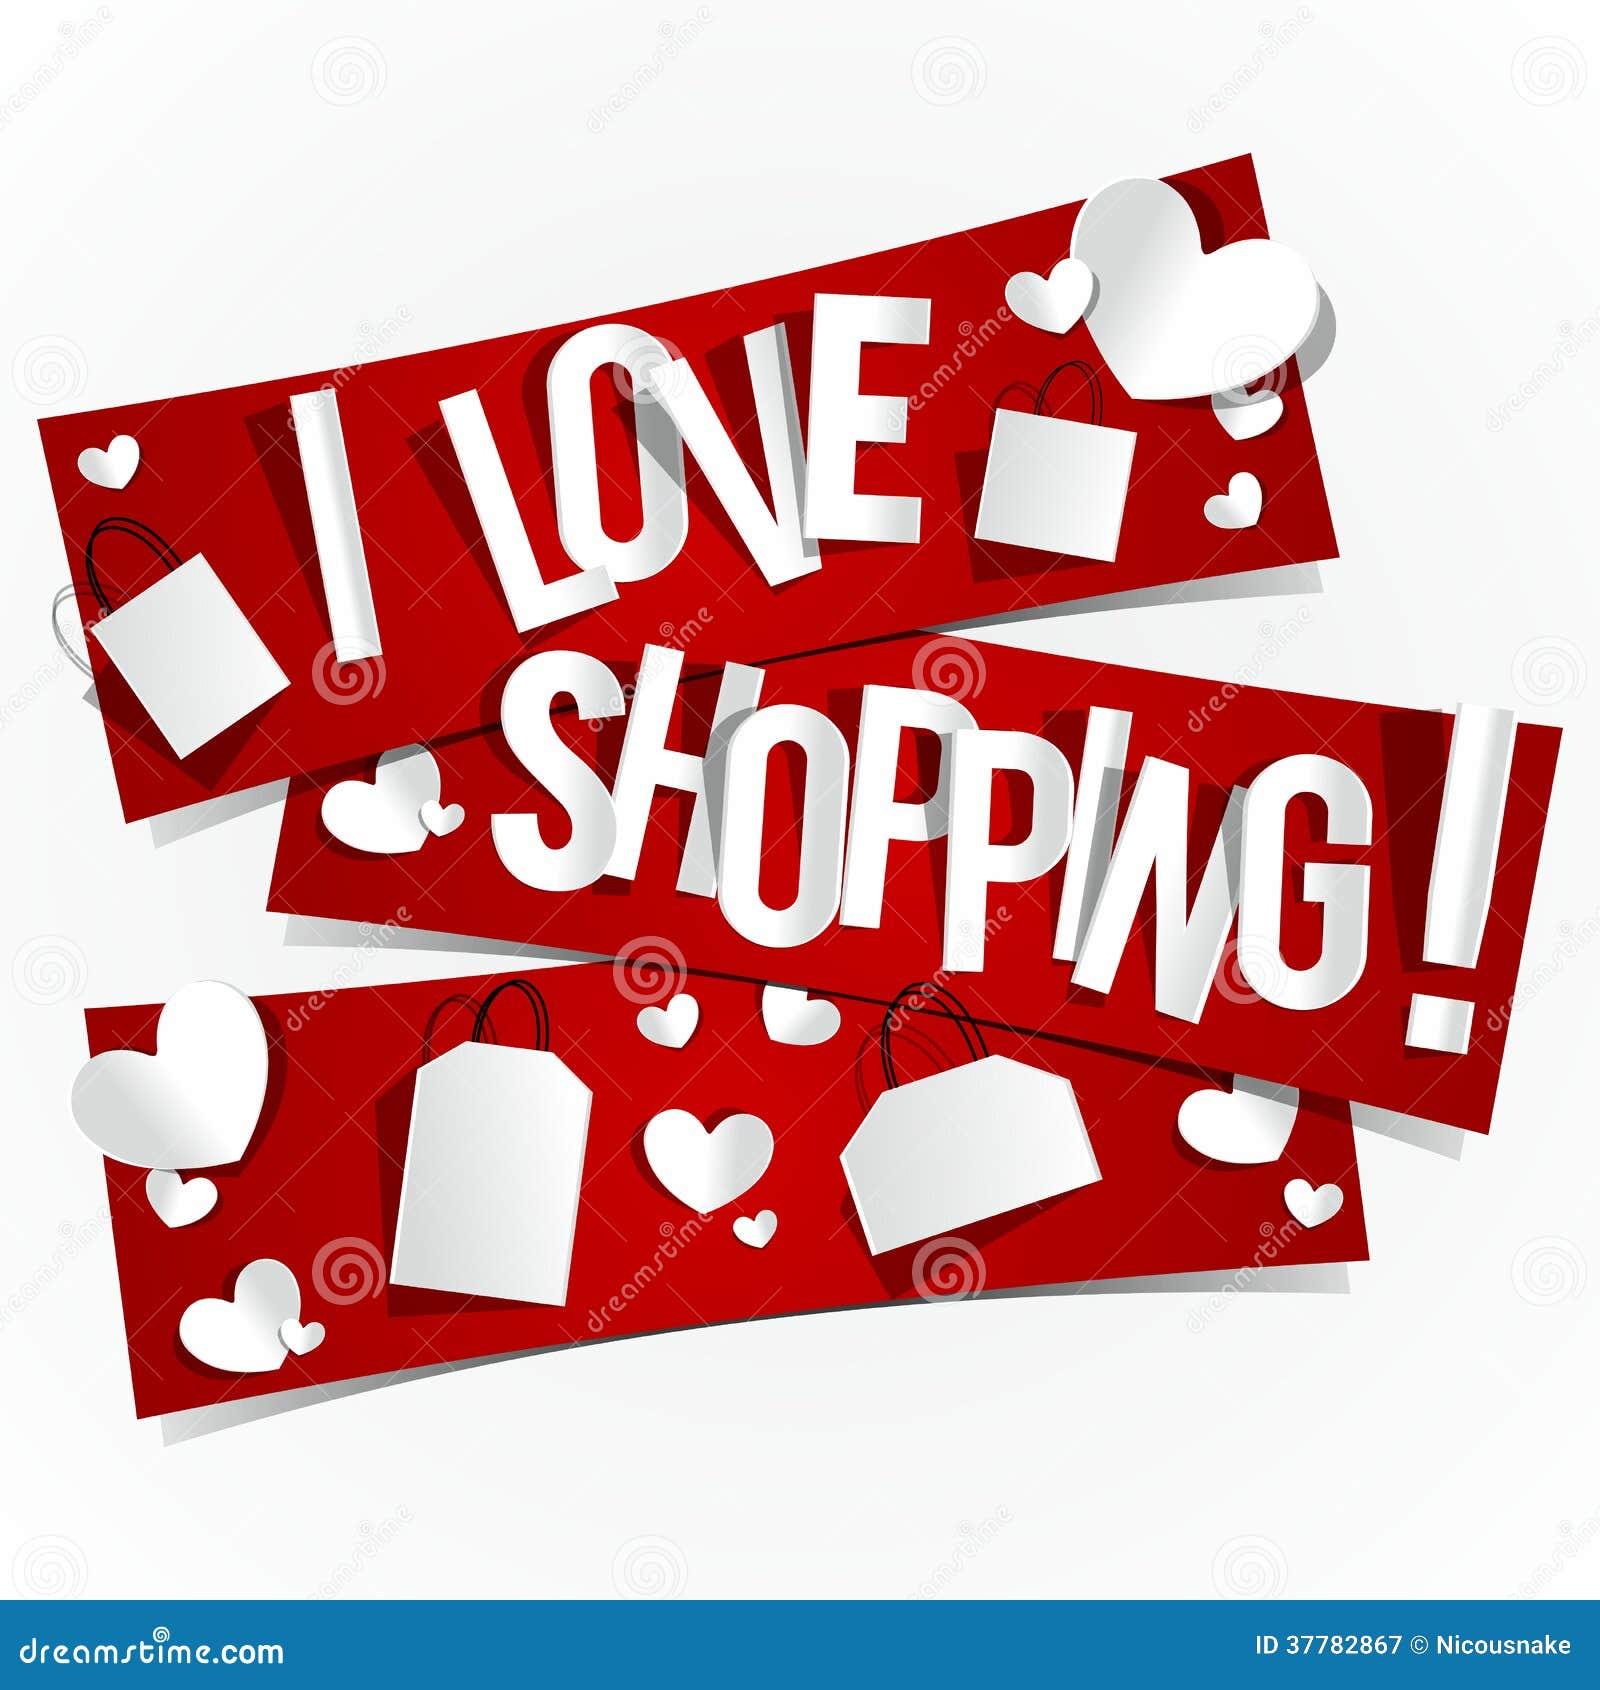 I Love Shopping Royalty Free Stock Photography Image